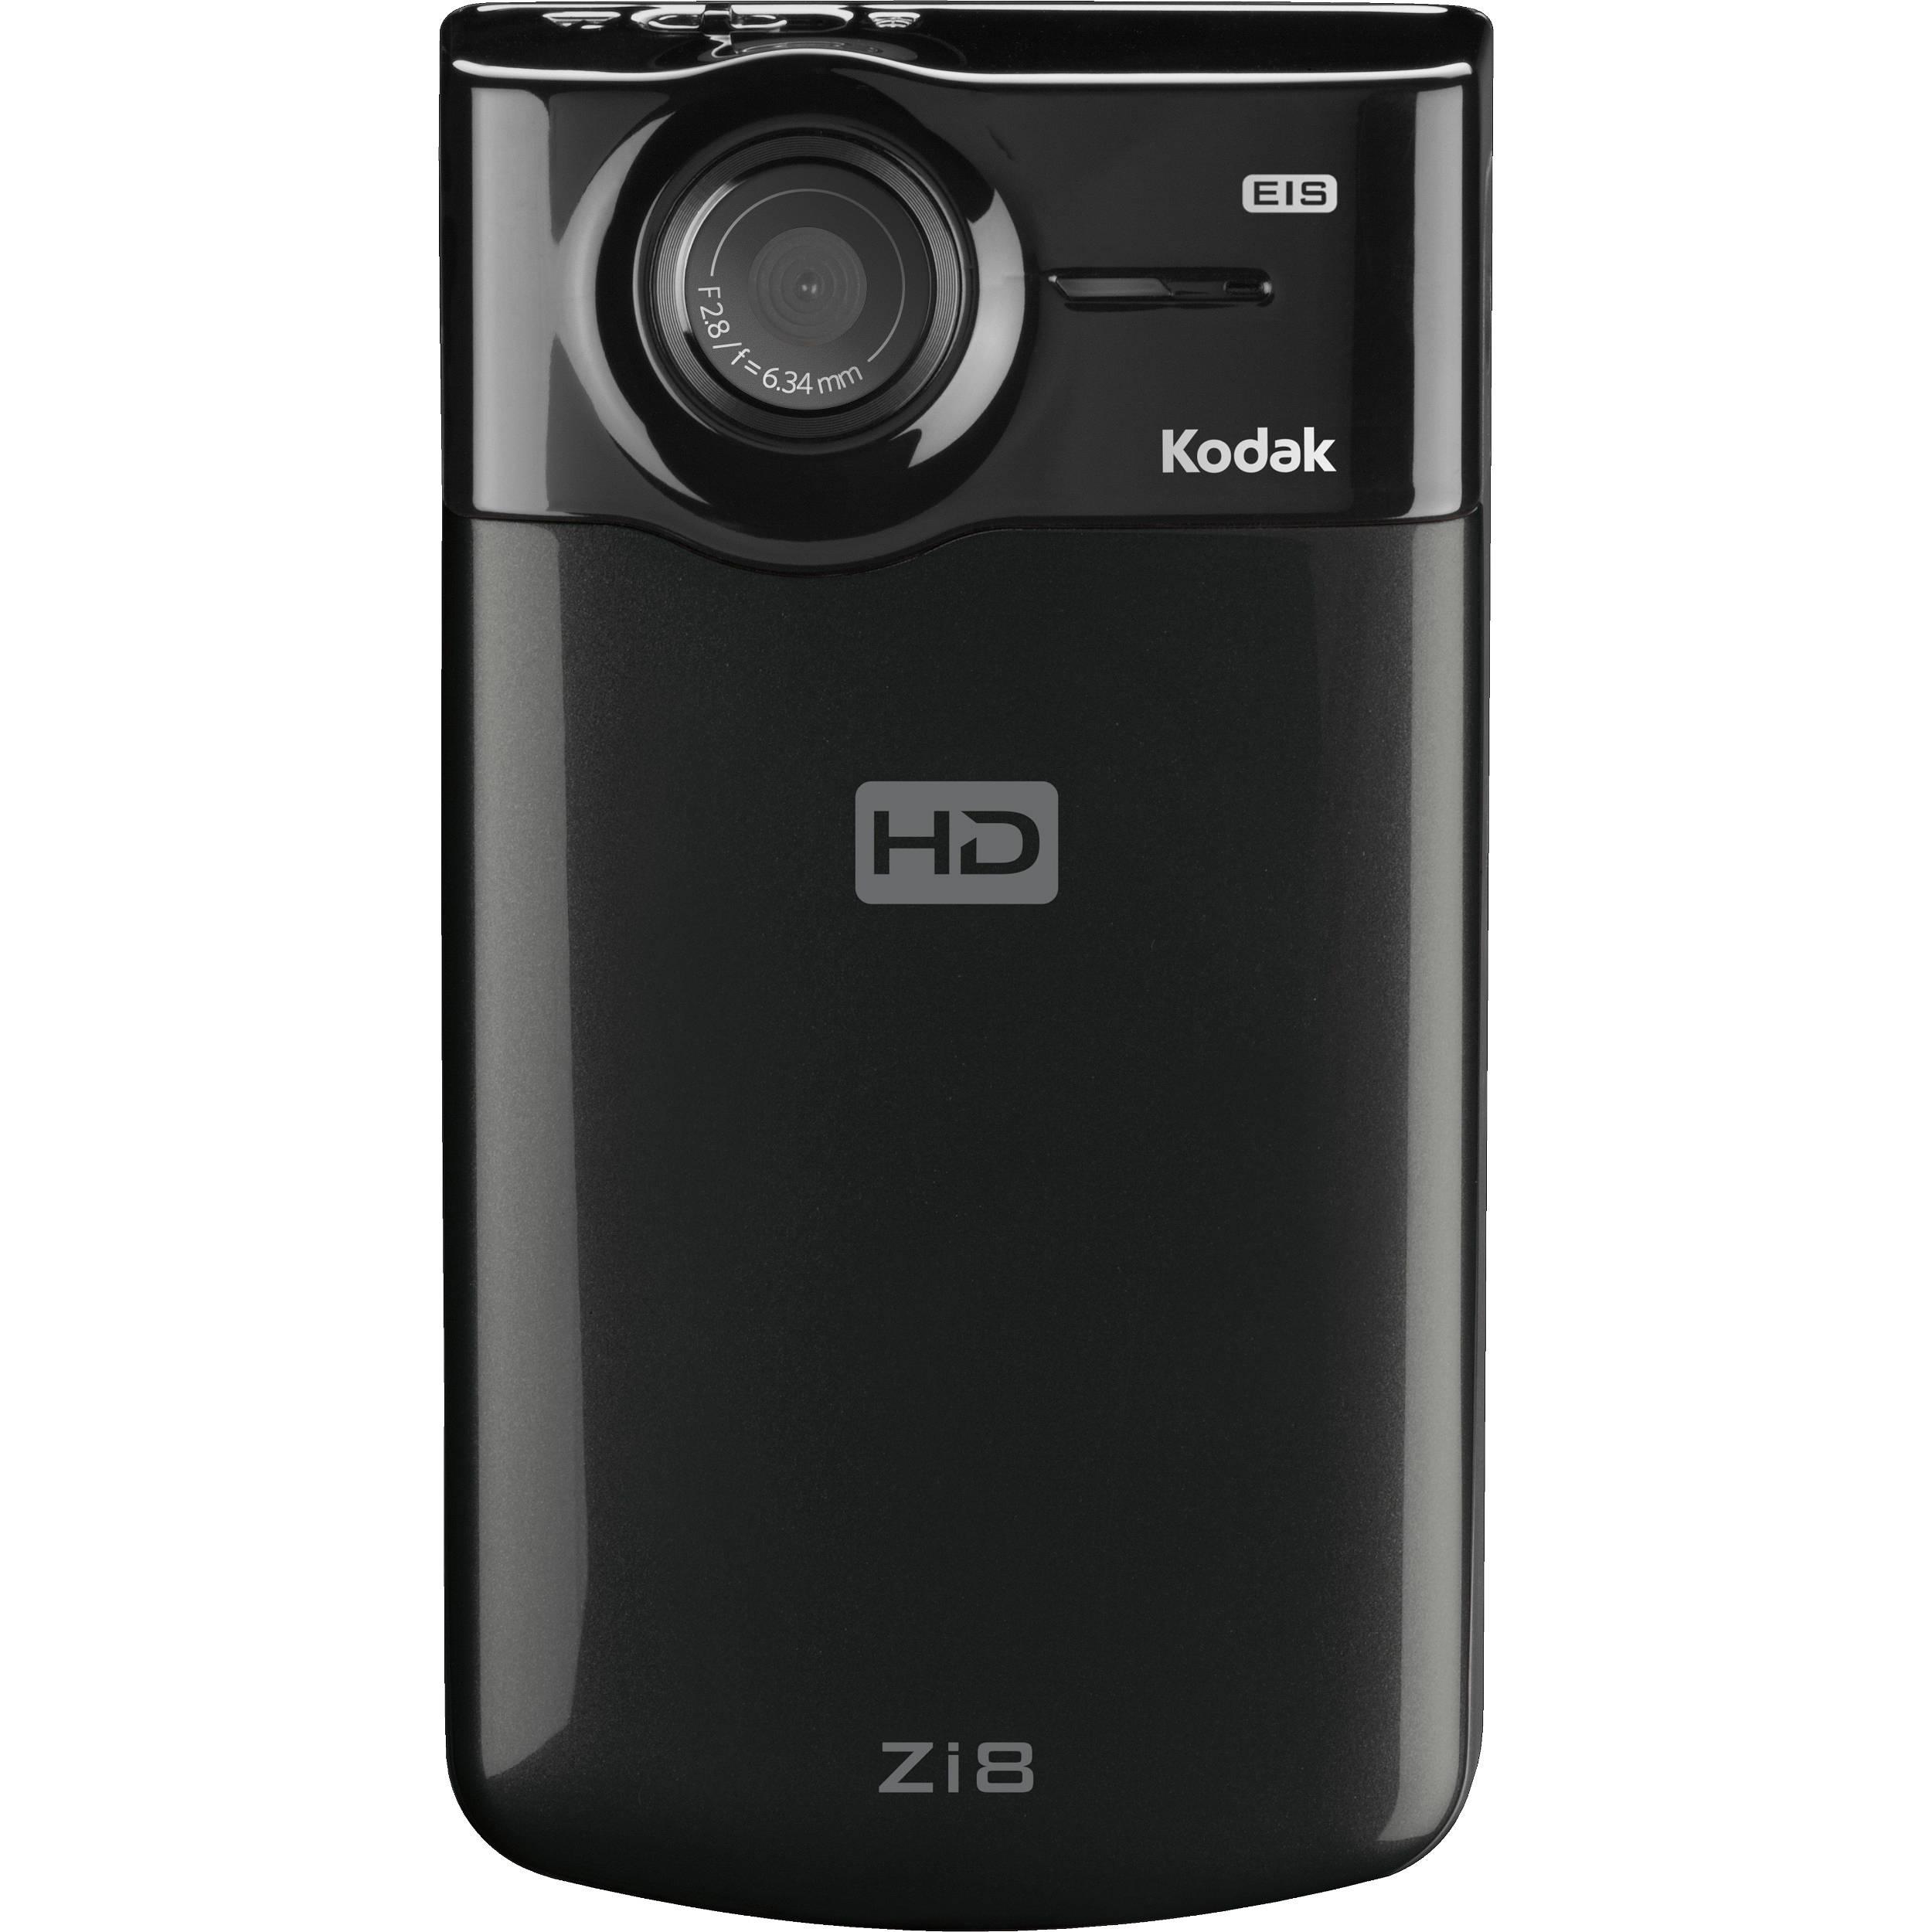 kodak zi8 pocket video camera black 8796062 b h photo video rh bhphotovideo com Kodak Black Kodak Black